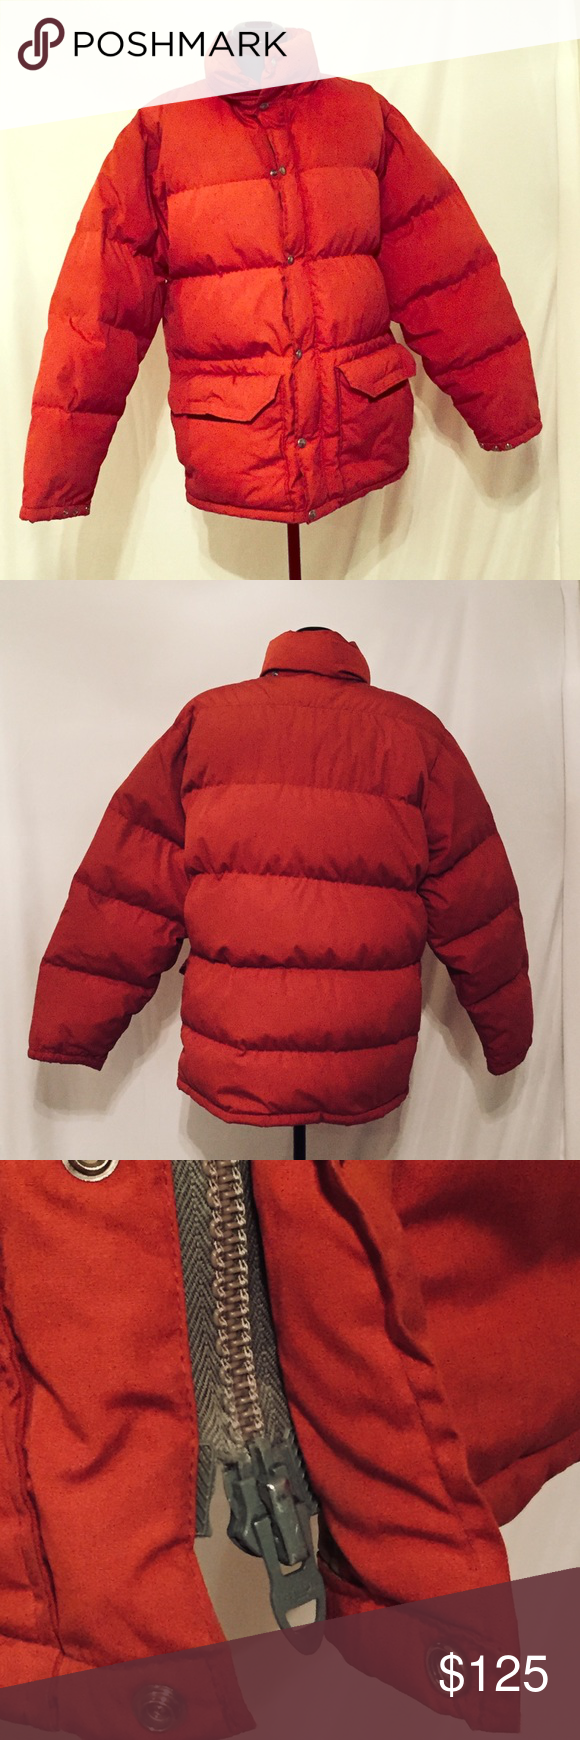 a716a0017 ireland north face mens matching jacket 9e700 695be